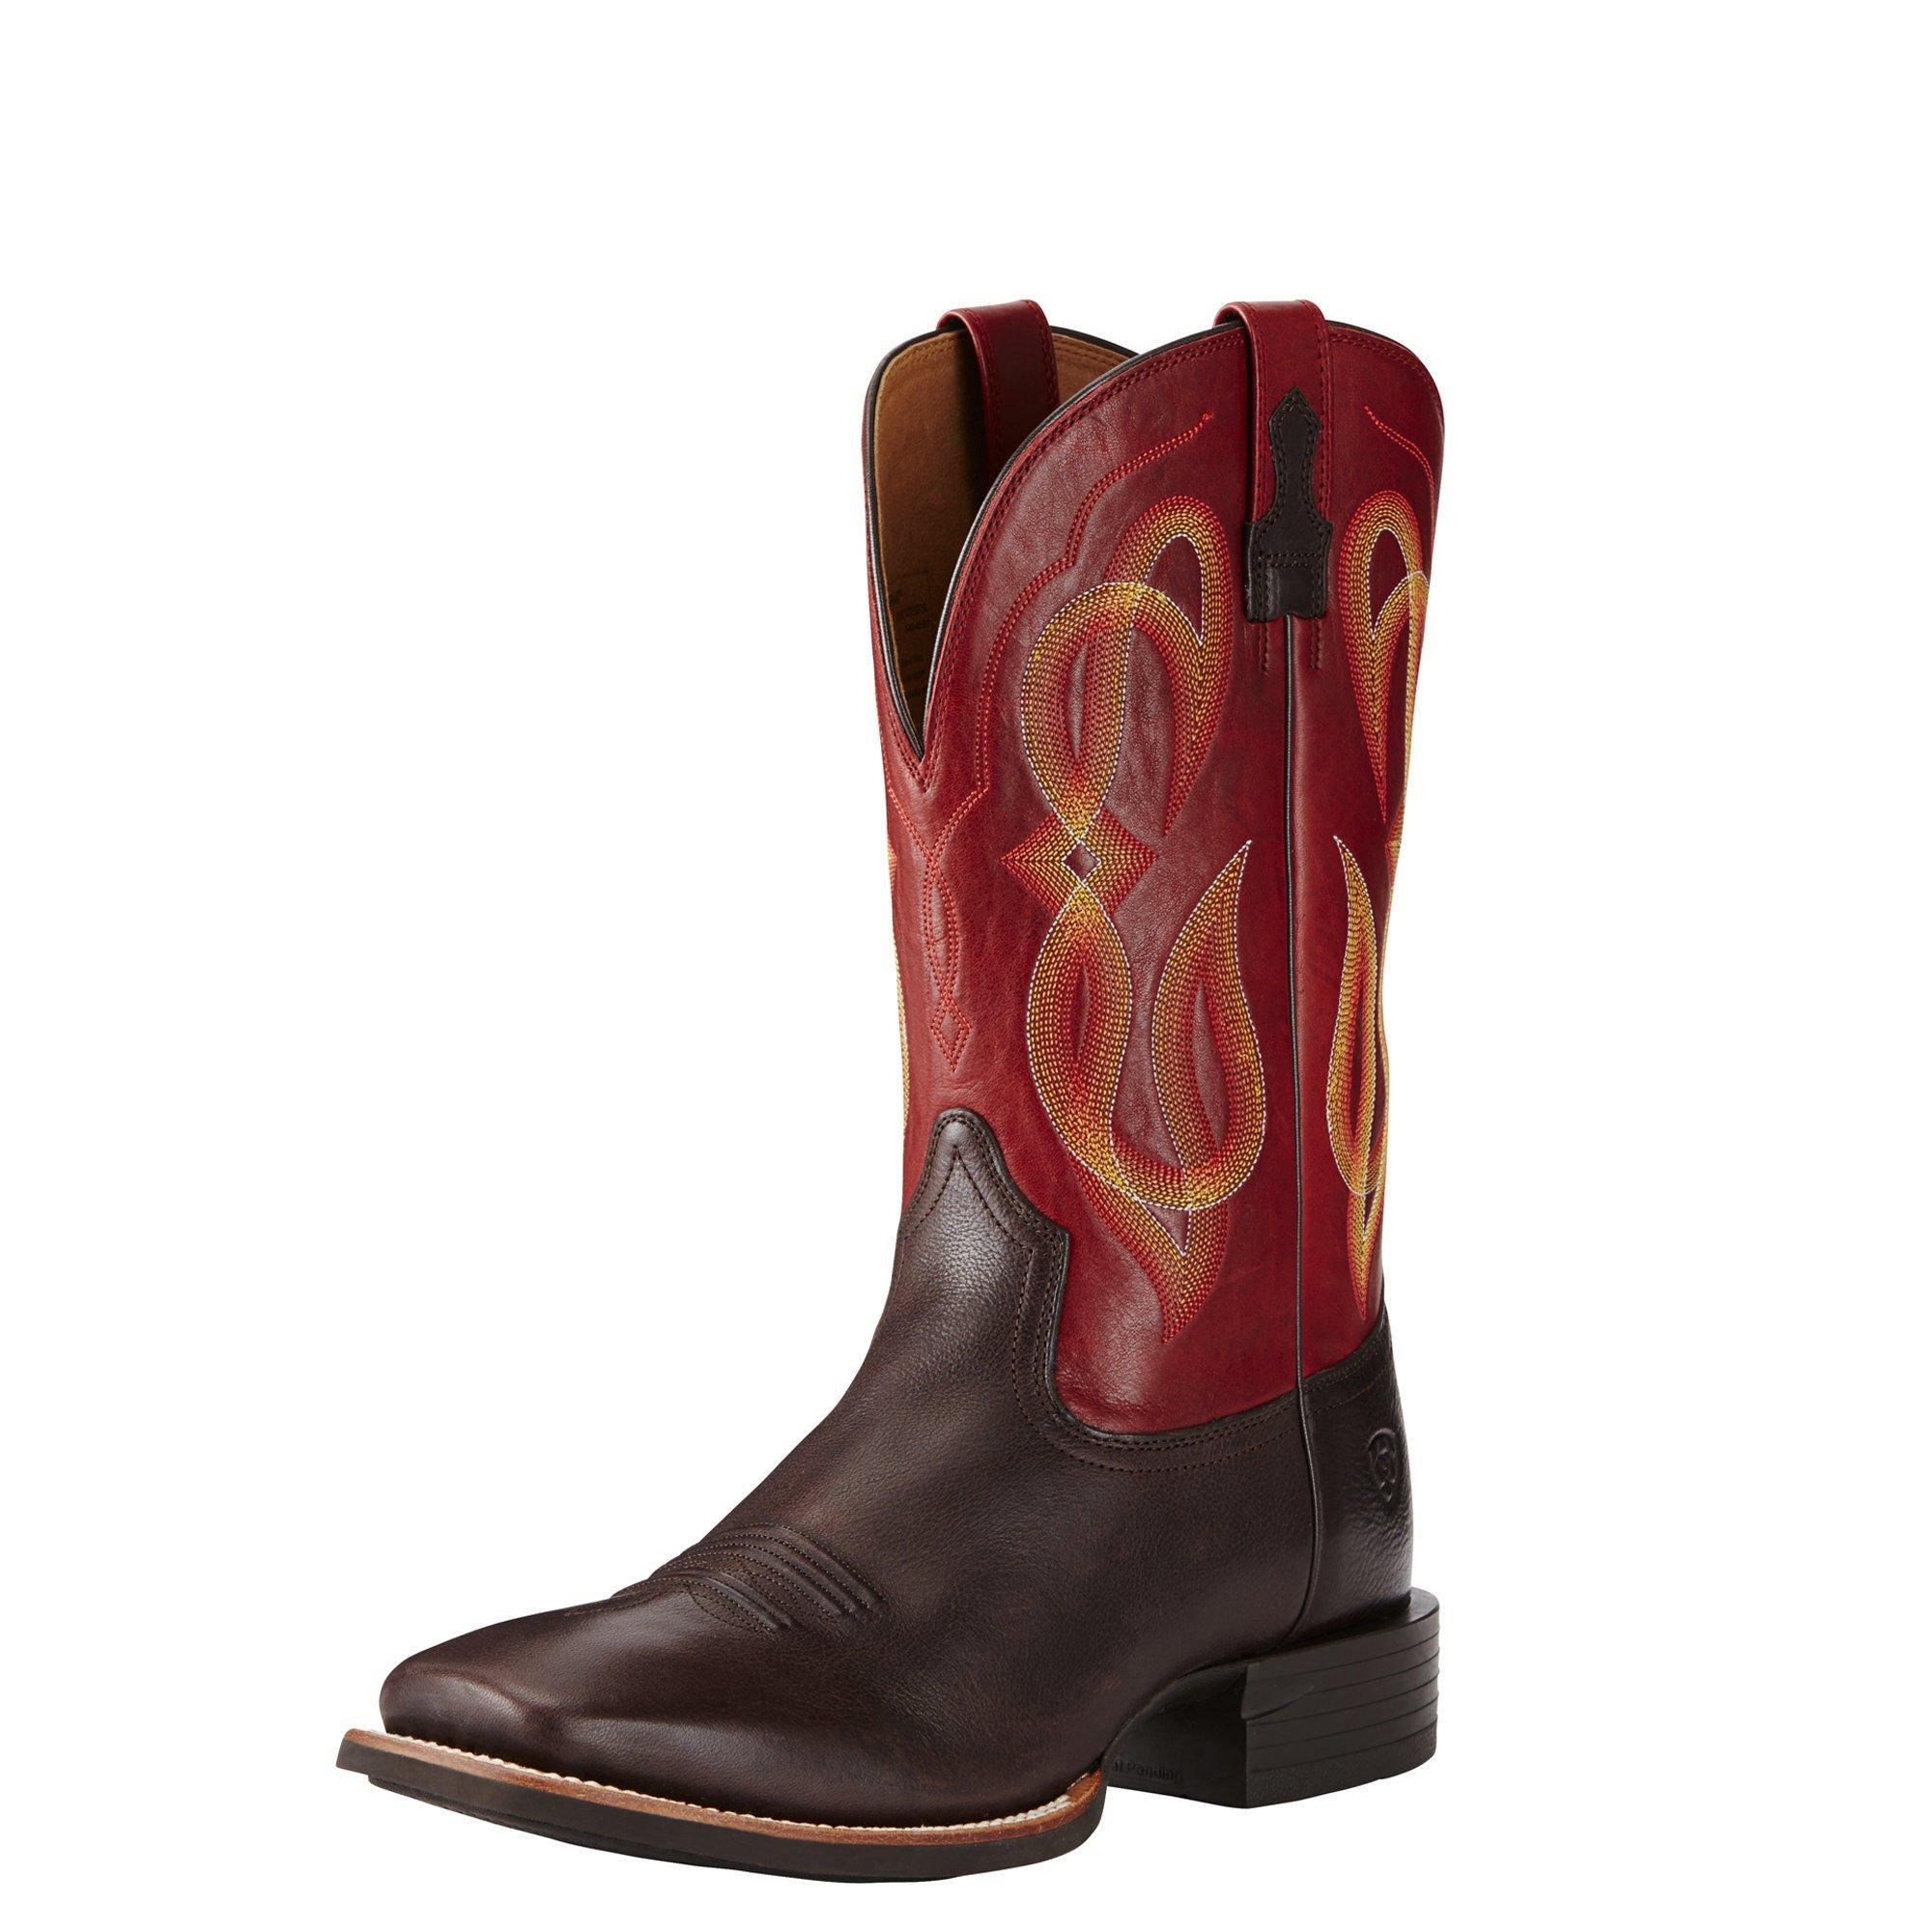 Ariat Men's Quantum Brander Western Cowboy Boot, Cowboy Coffee, 8.5 D US